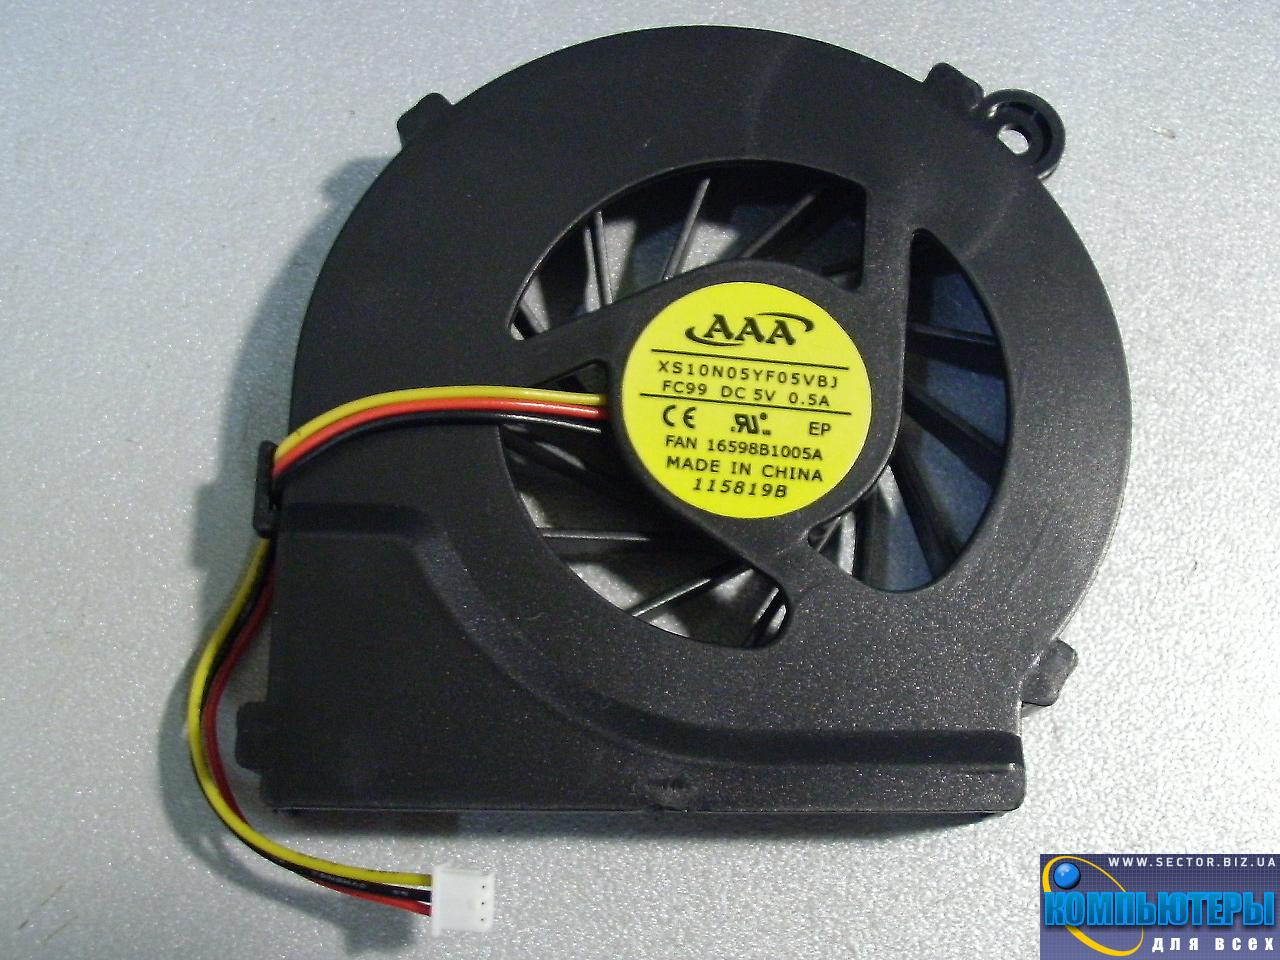 Кулер к ноутбуку HP Compaq CQ42 G42 G4 G6 G7 CQ56 G56 p/n: XS10N05YF05VBJ. Фото № 3.